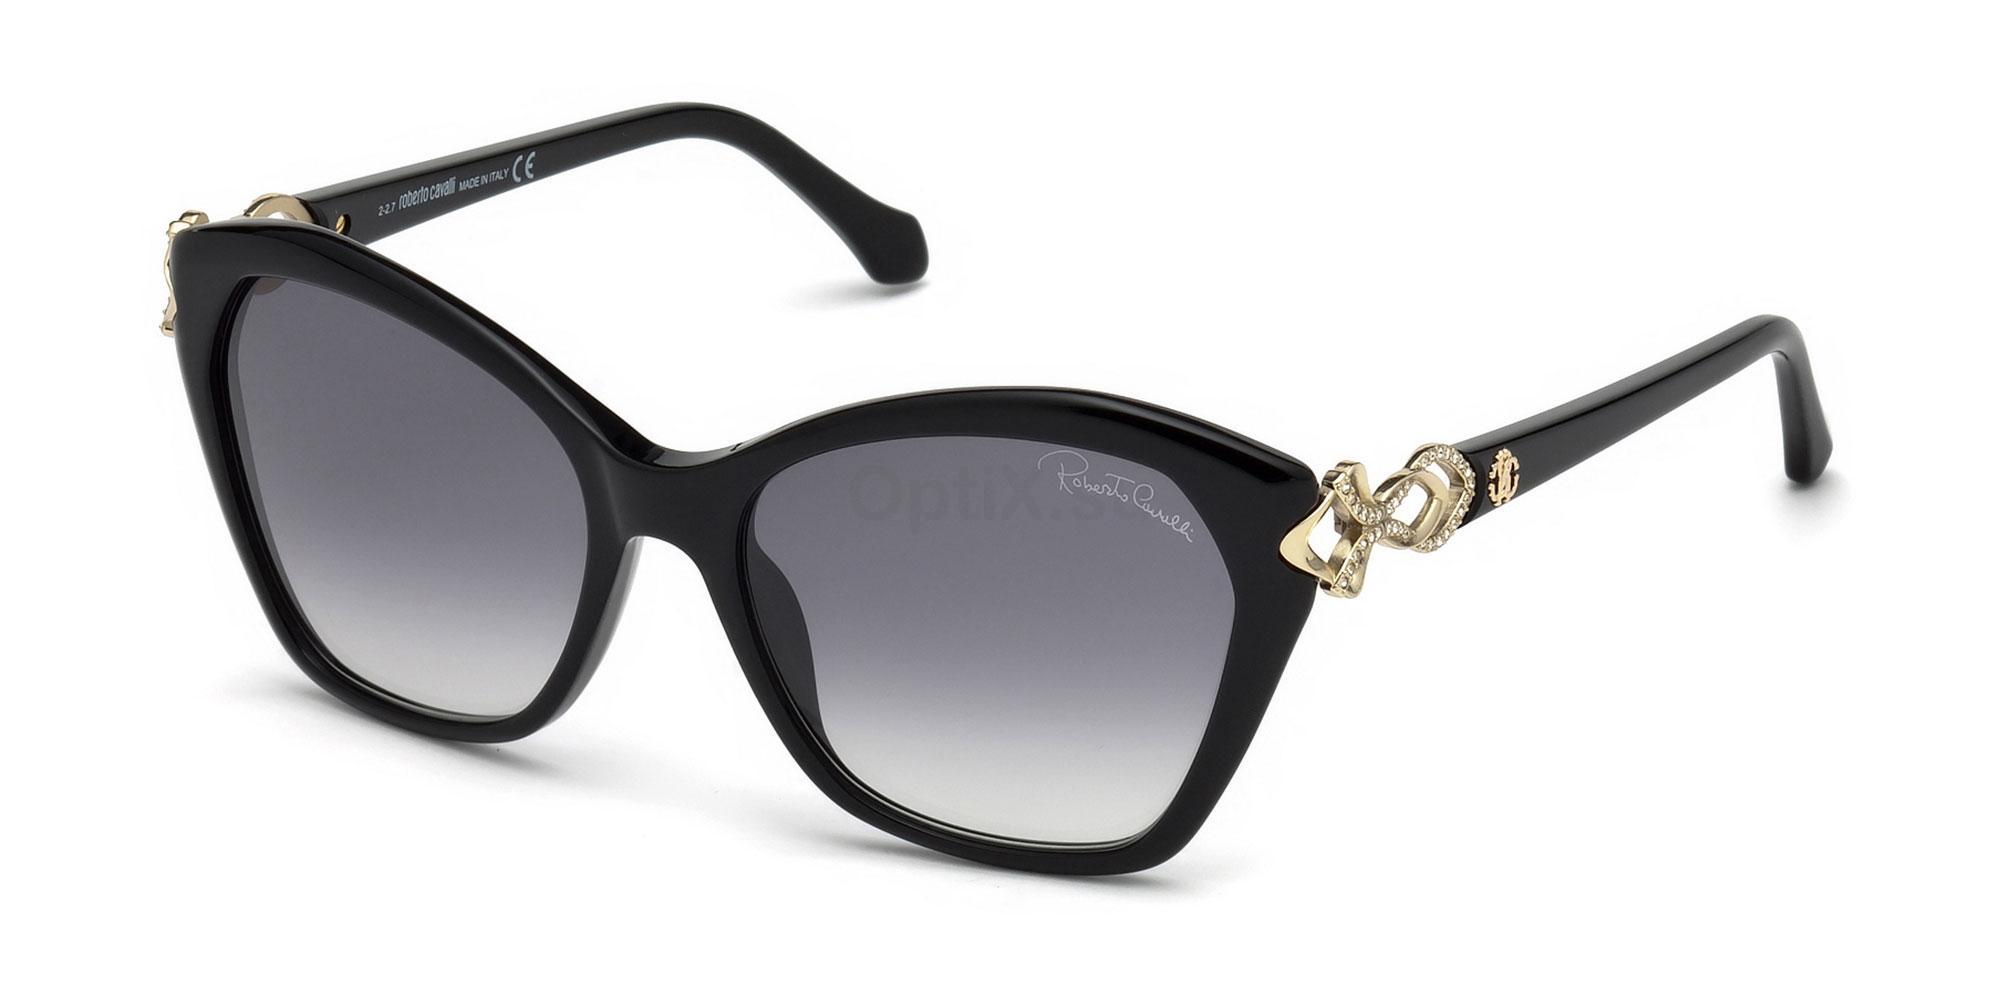 01B RC1077 Sunglasses, Roberto Cavalli